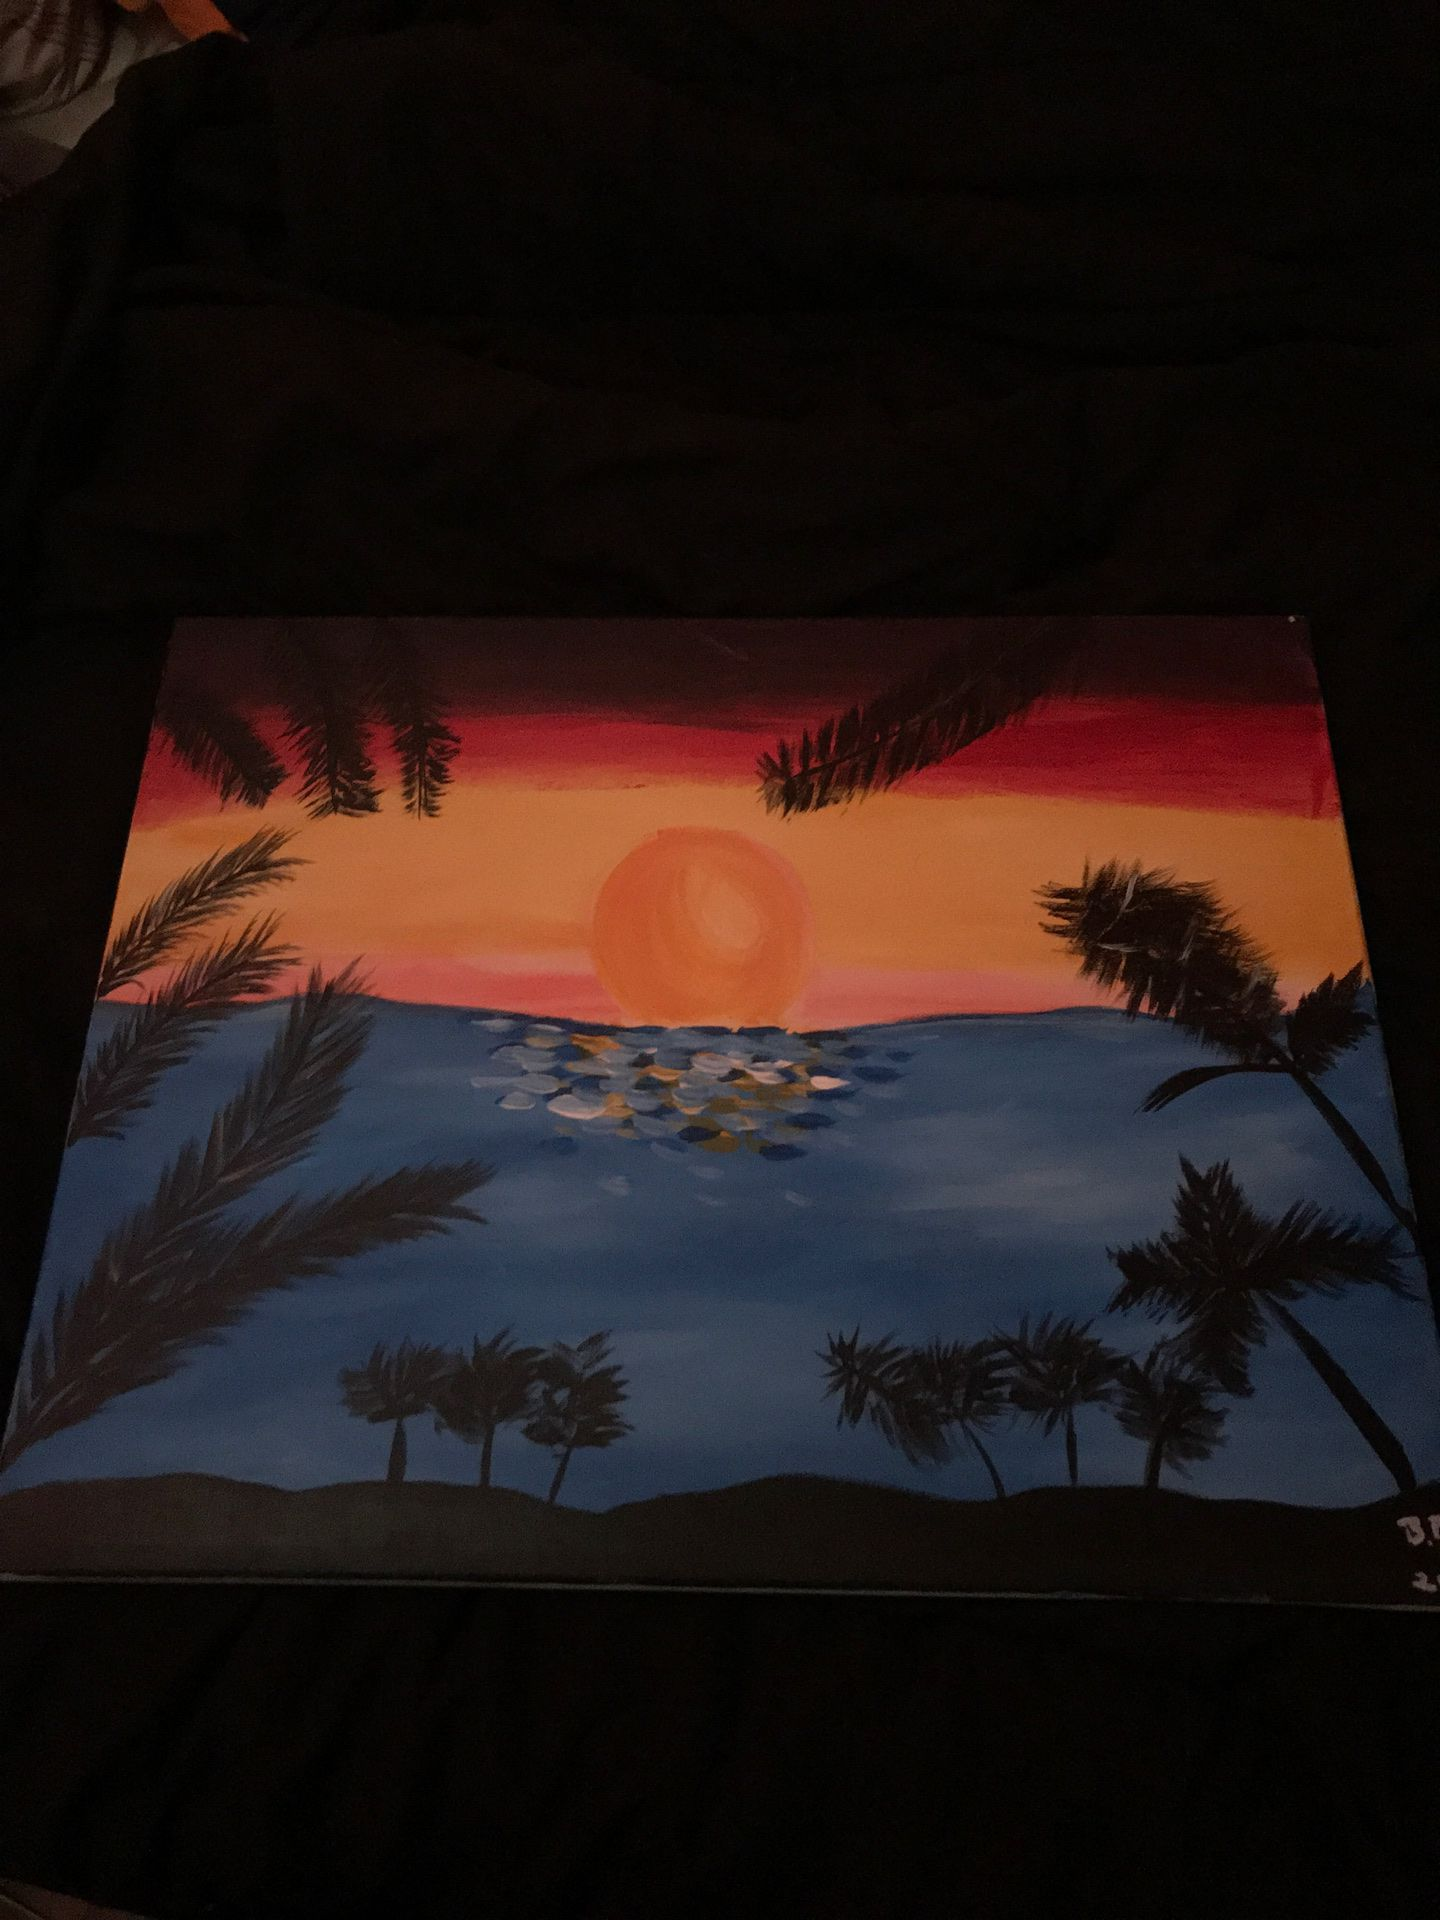 Good sun rise painting